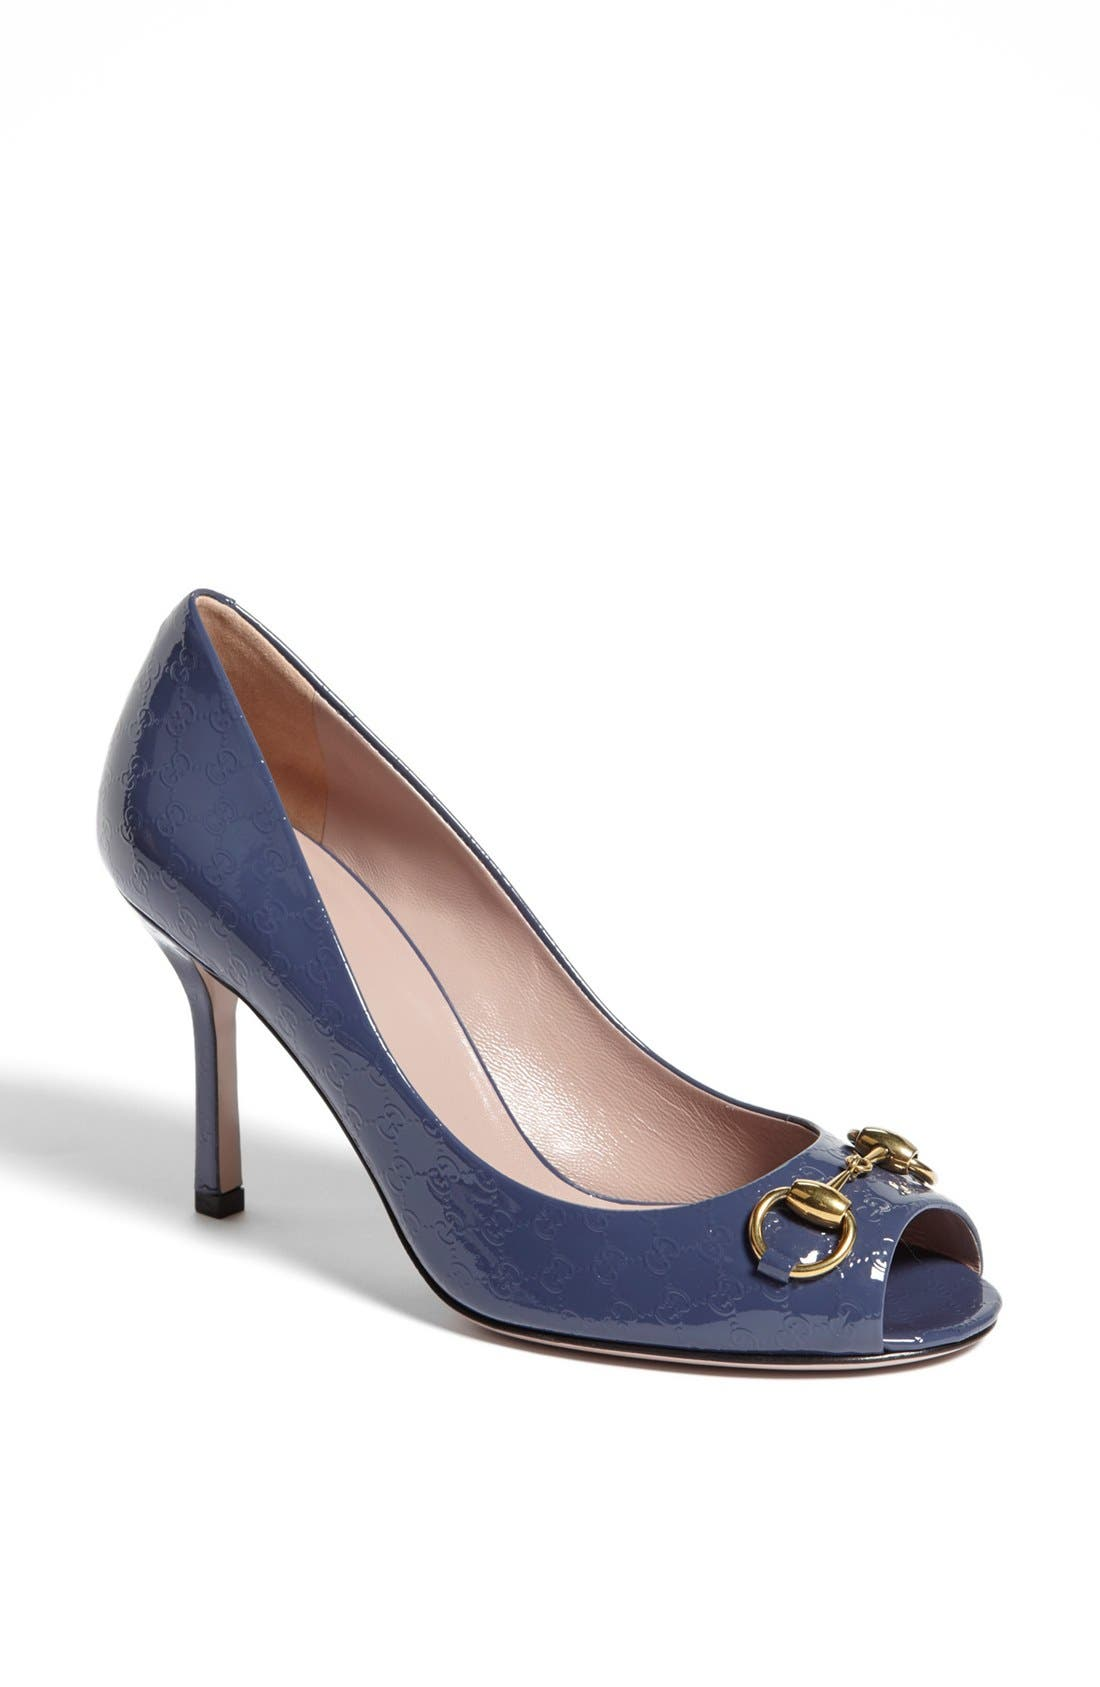 Alternate Image 1 Selected - Gucci 'Jolene' Peep Toe Pump